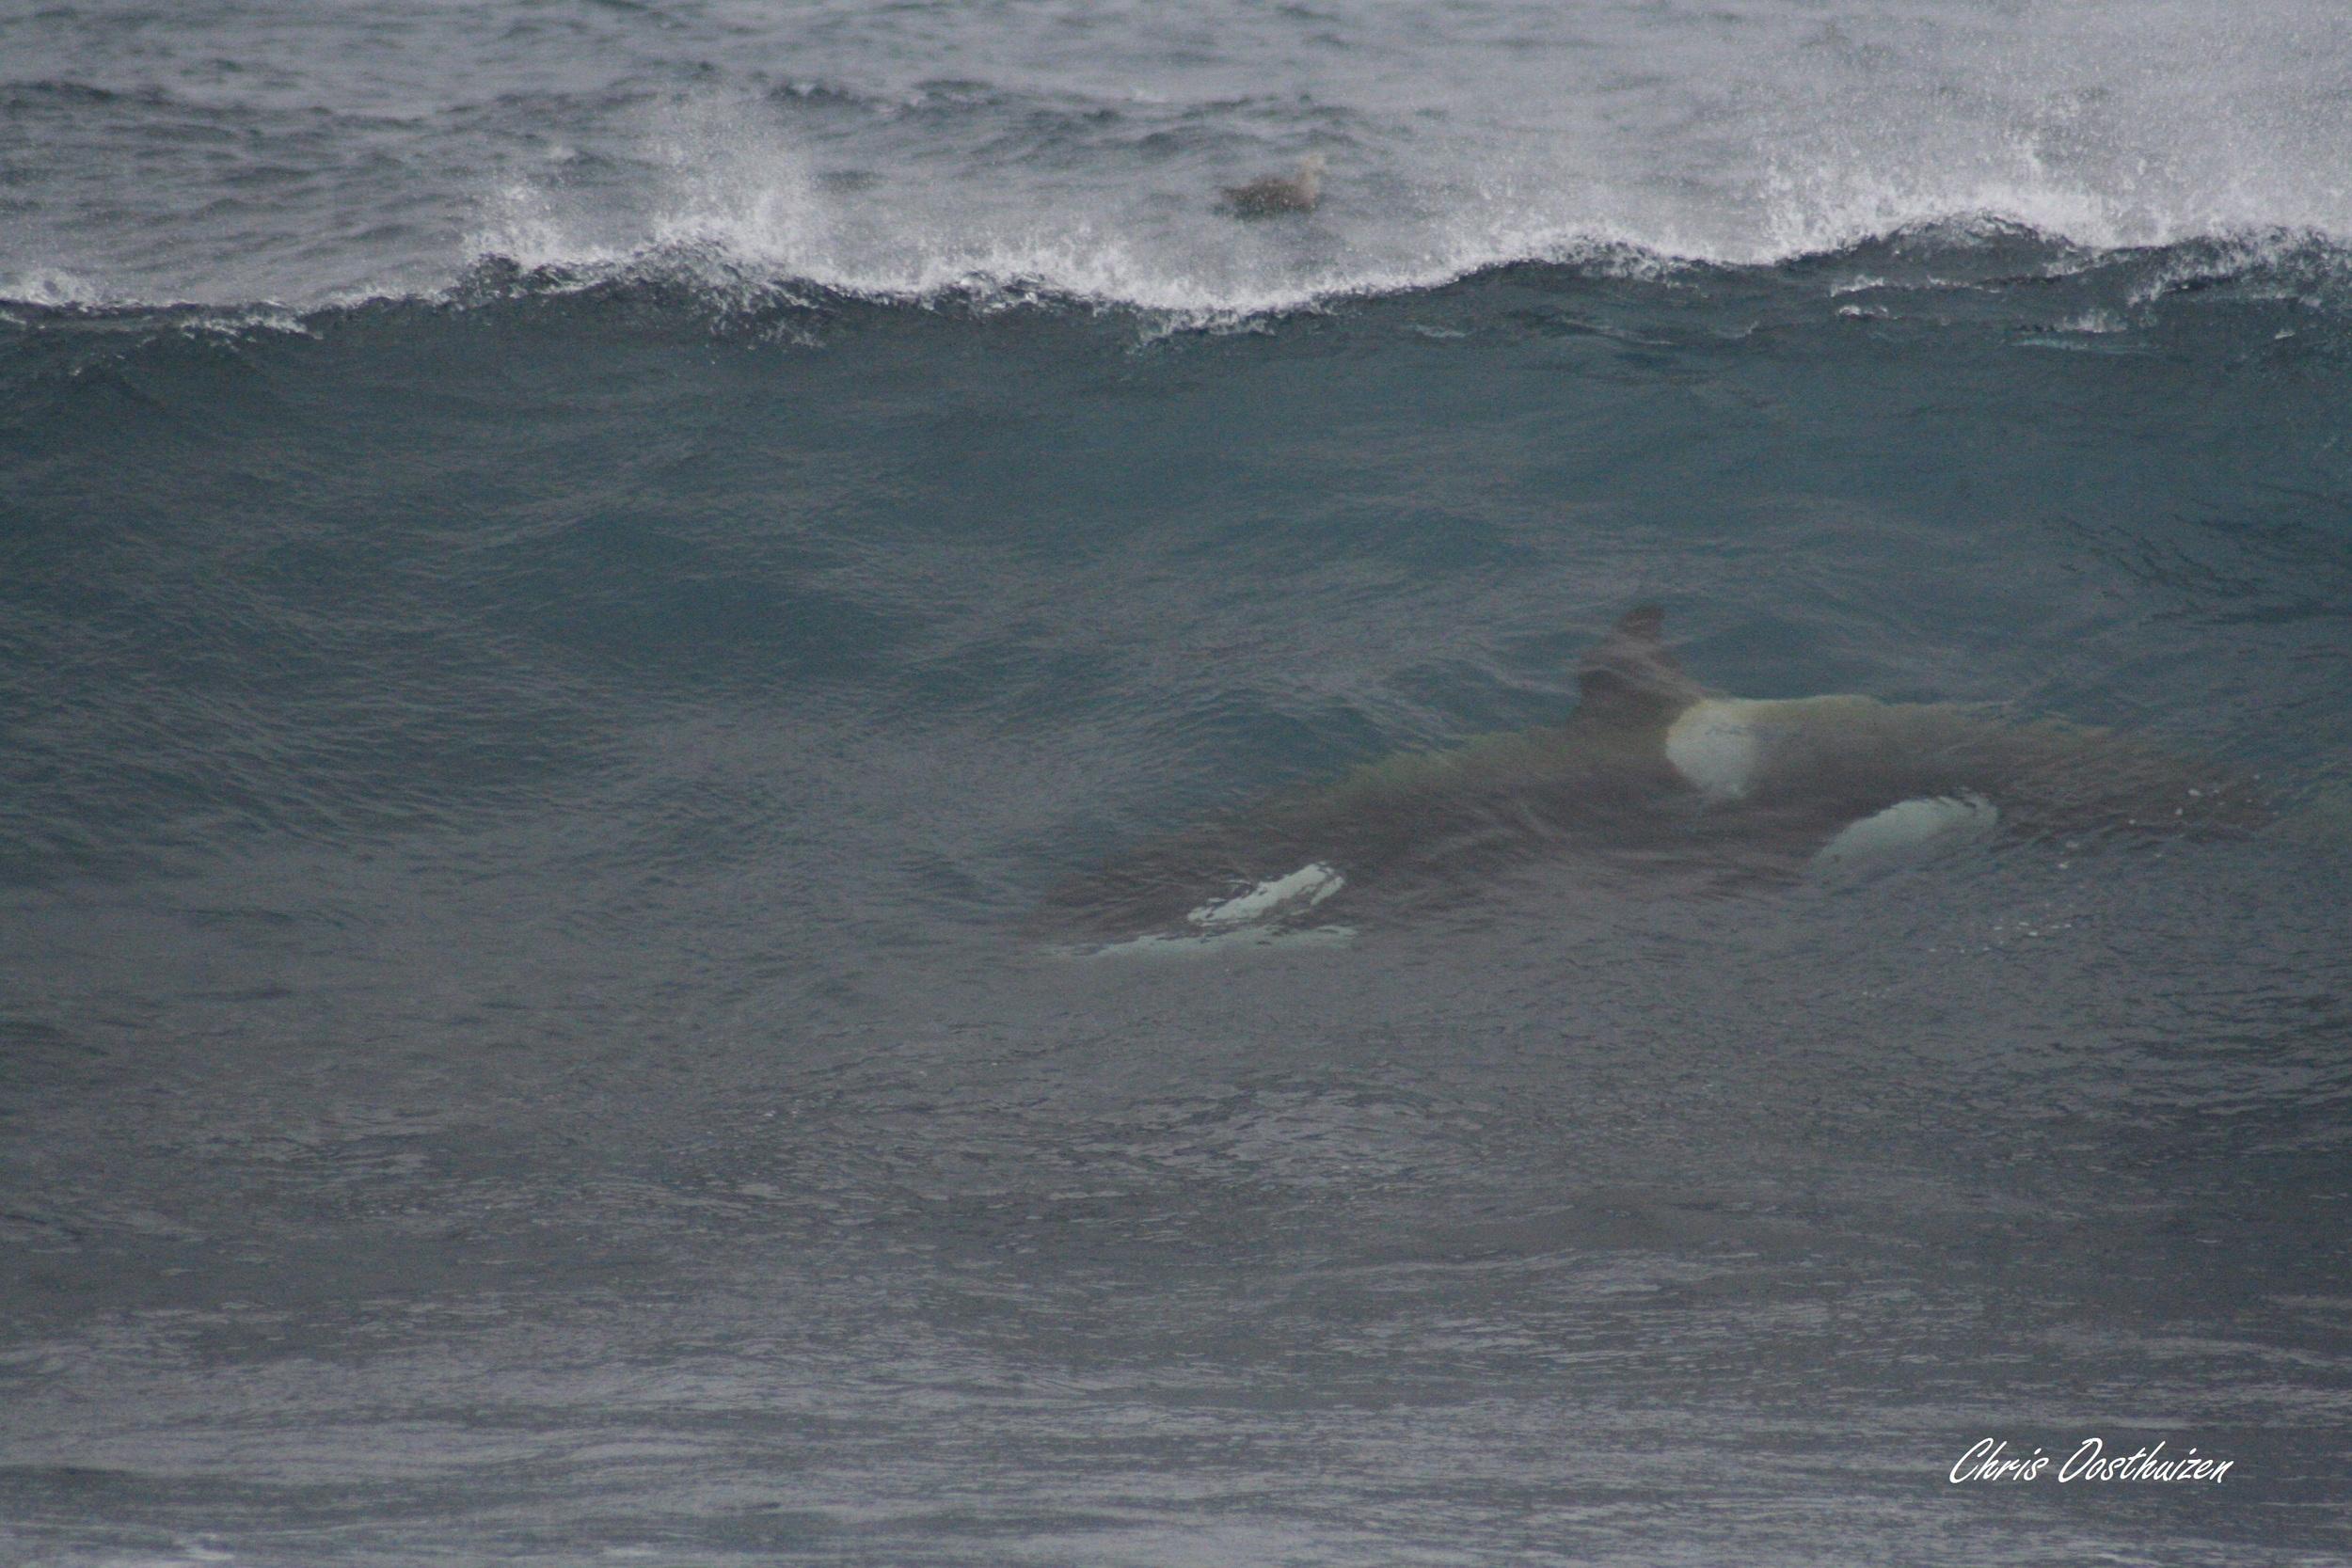 A wild killer whale at Subantarctic Marion Island. Photo: Chris Oosthuizen